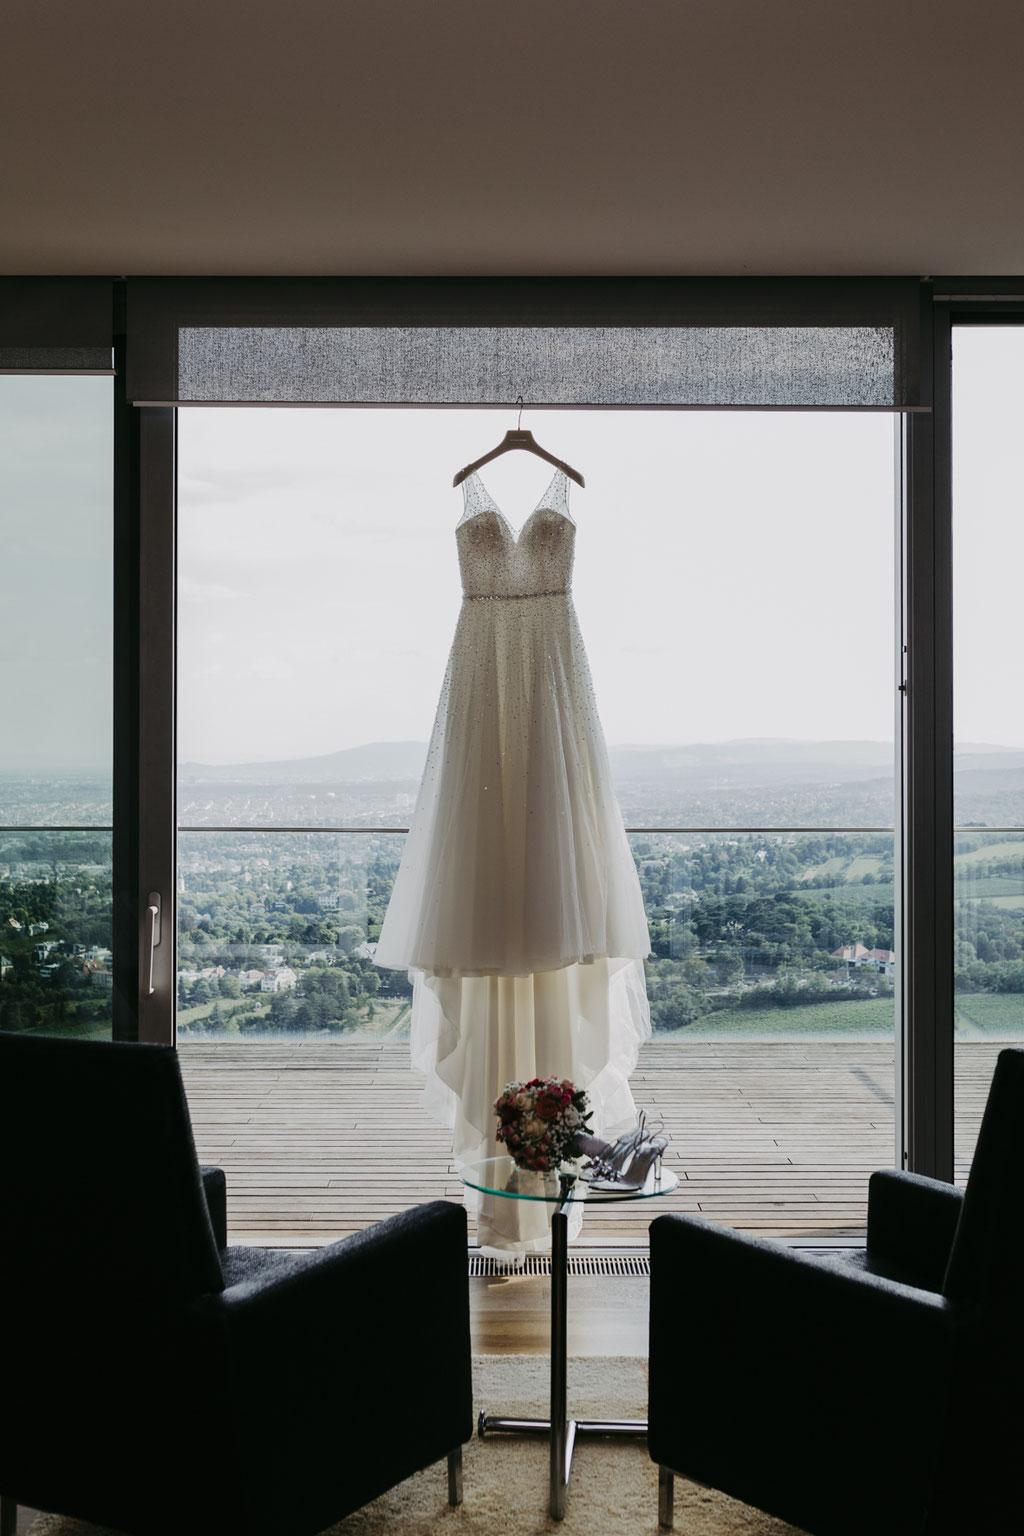 Brautkleid am Kahlenberg in Wien